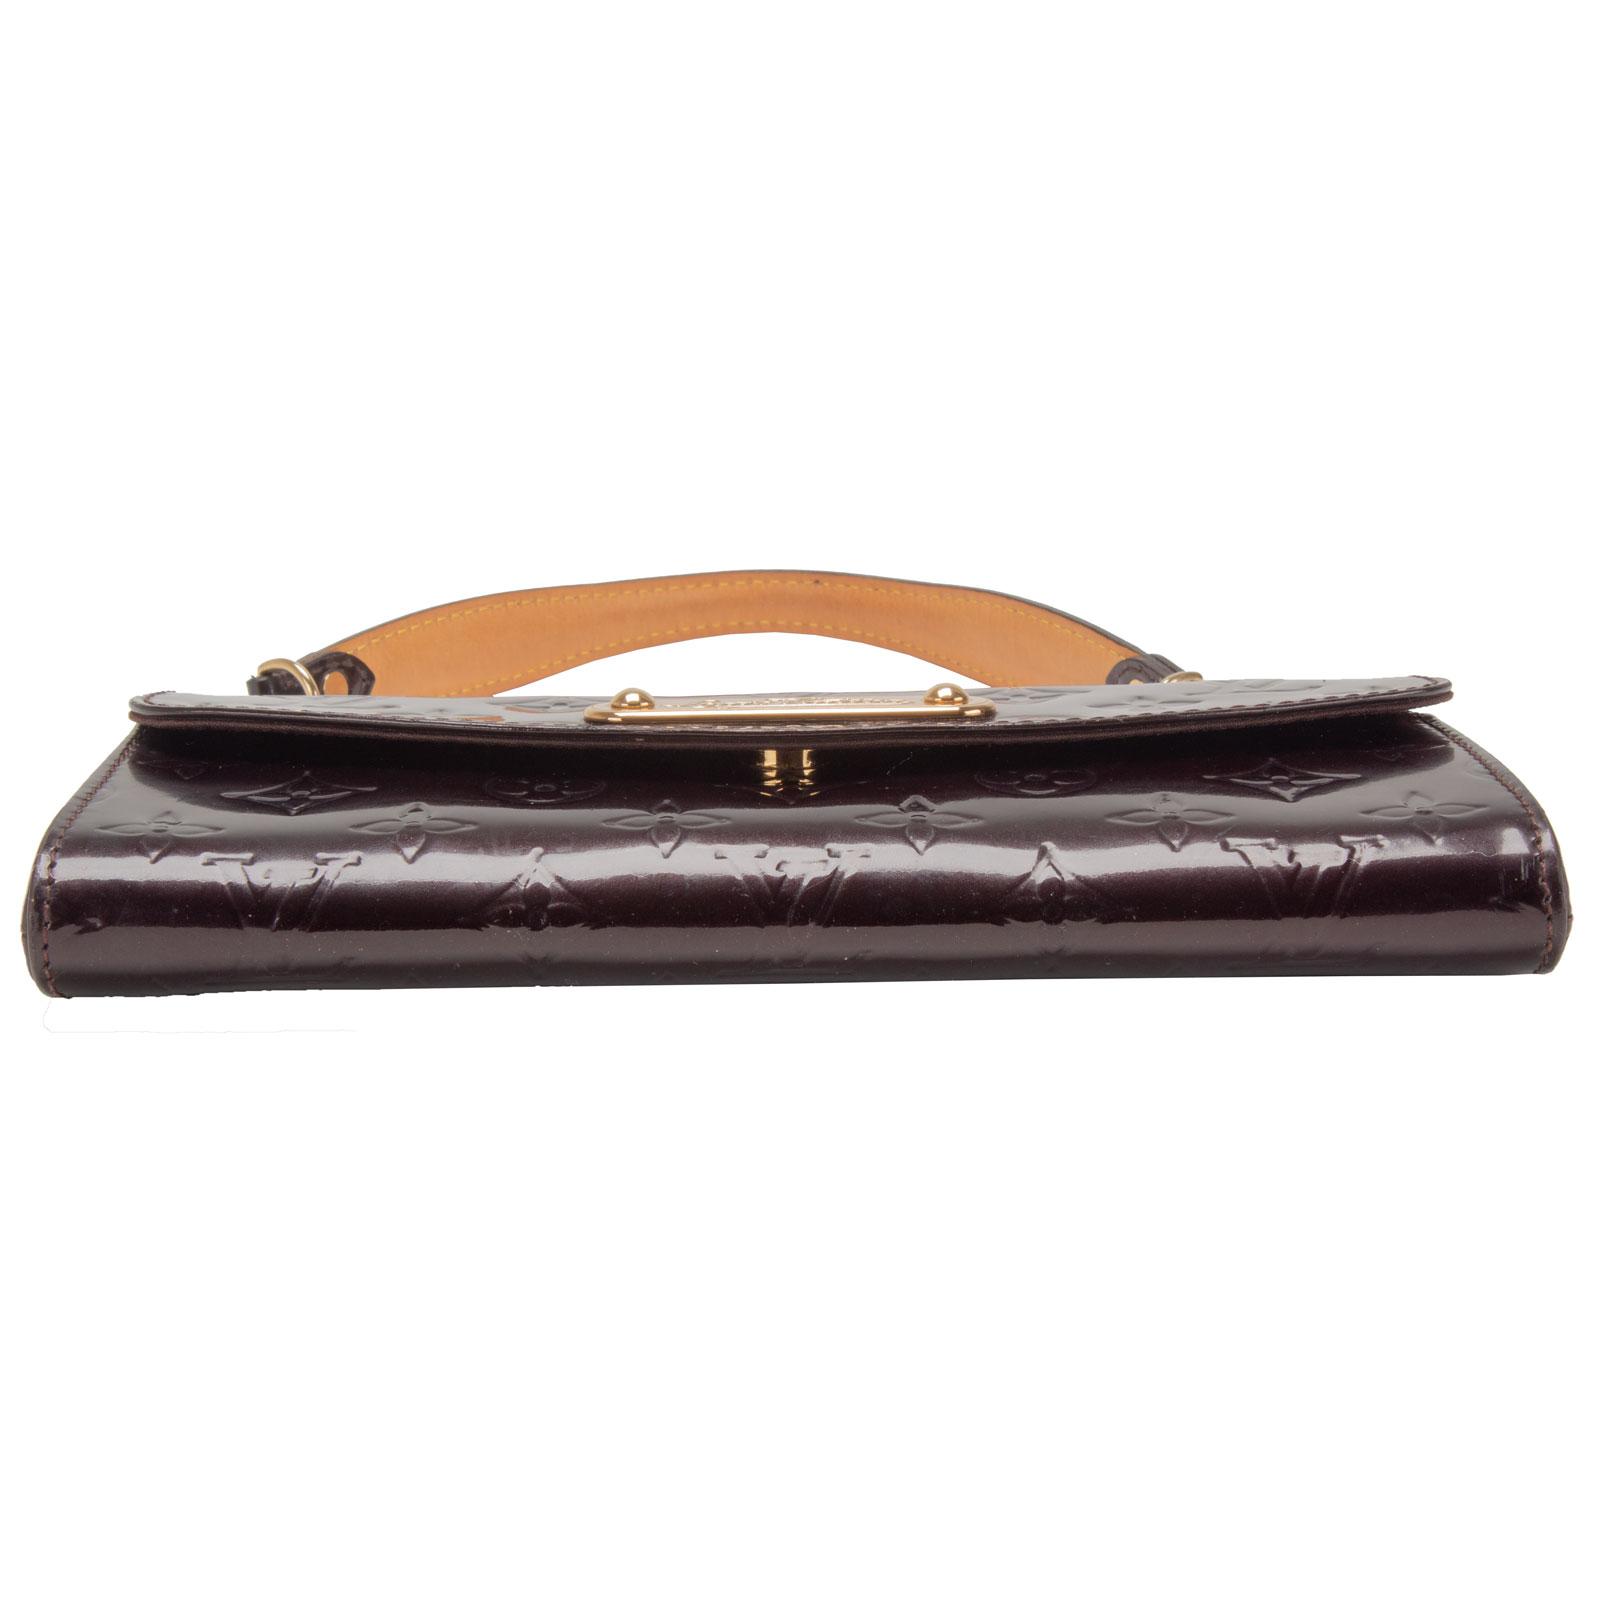 12988dad5c Clutch Louis Vuitton Sunset Boulevard | Box de Grife